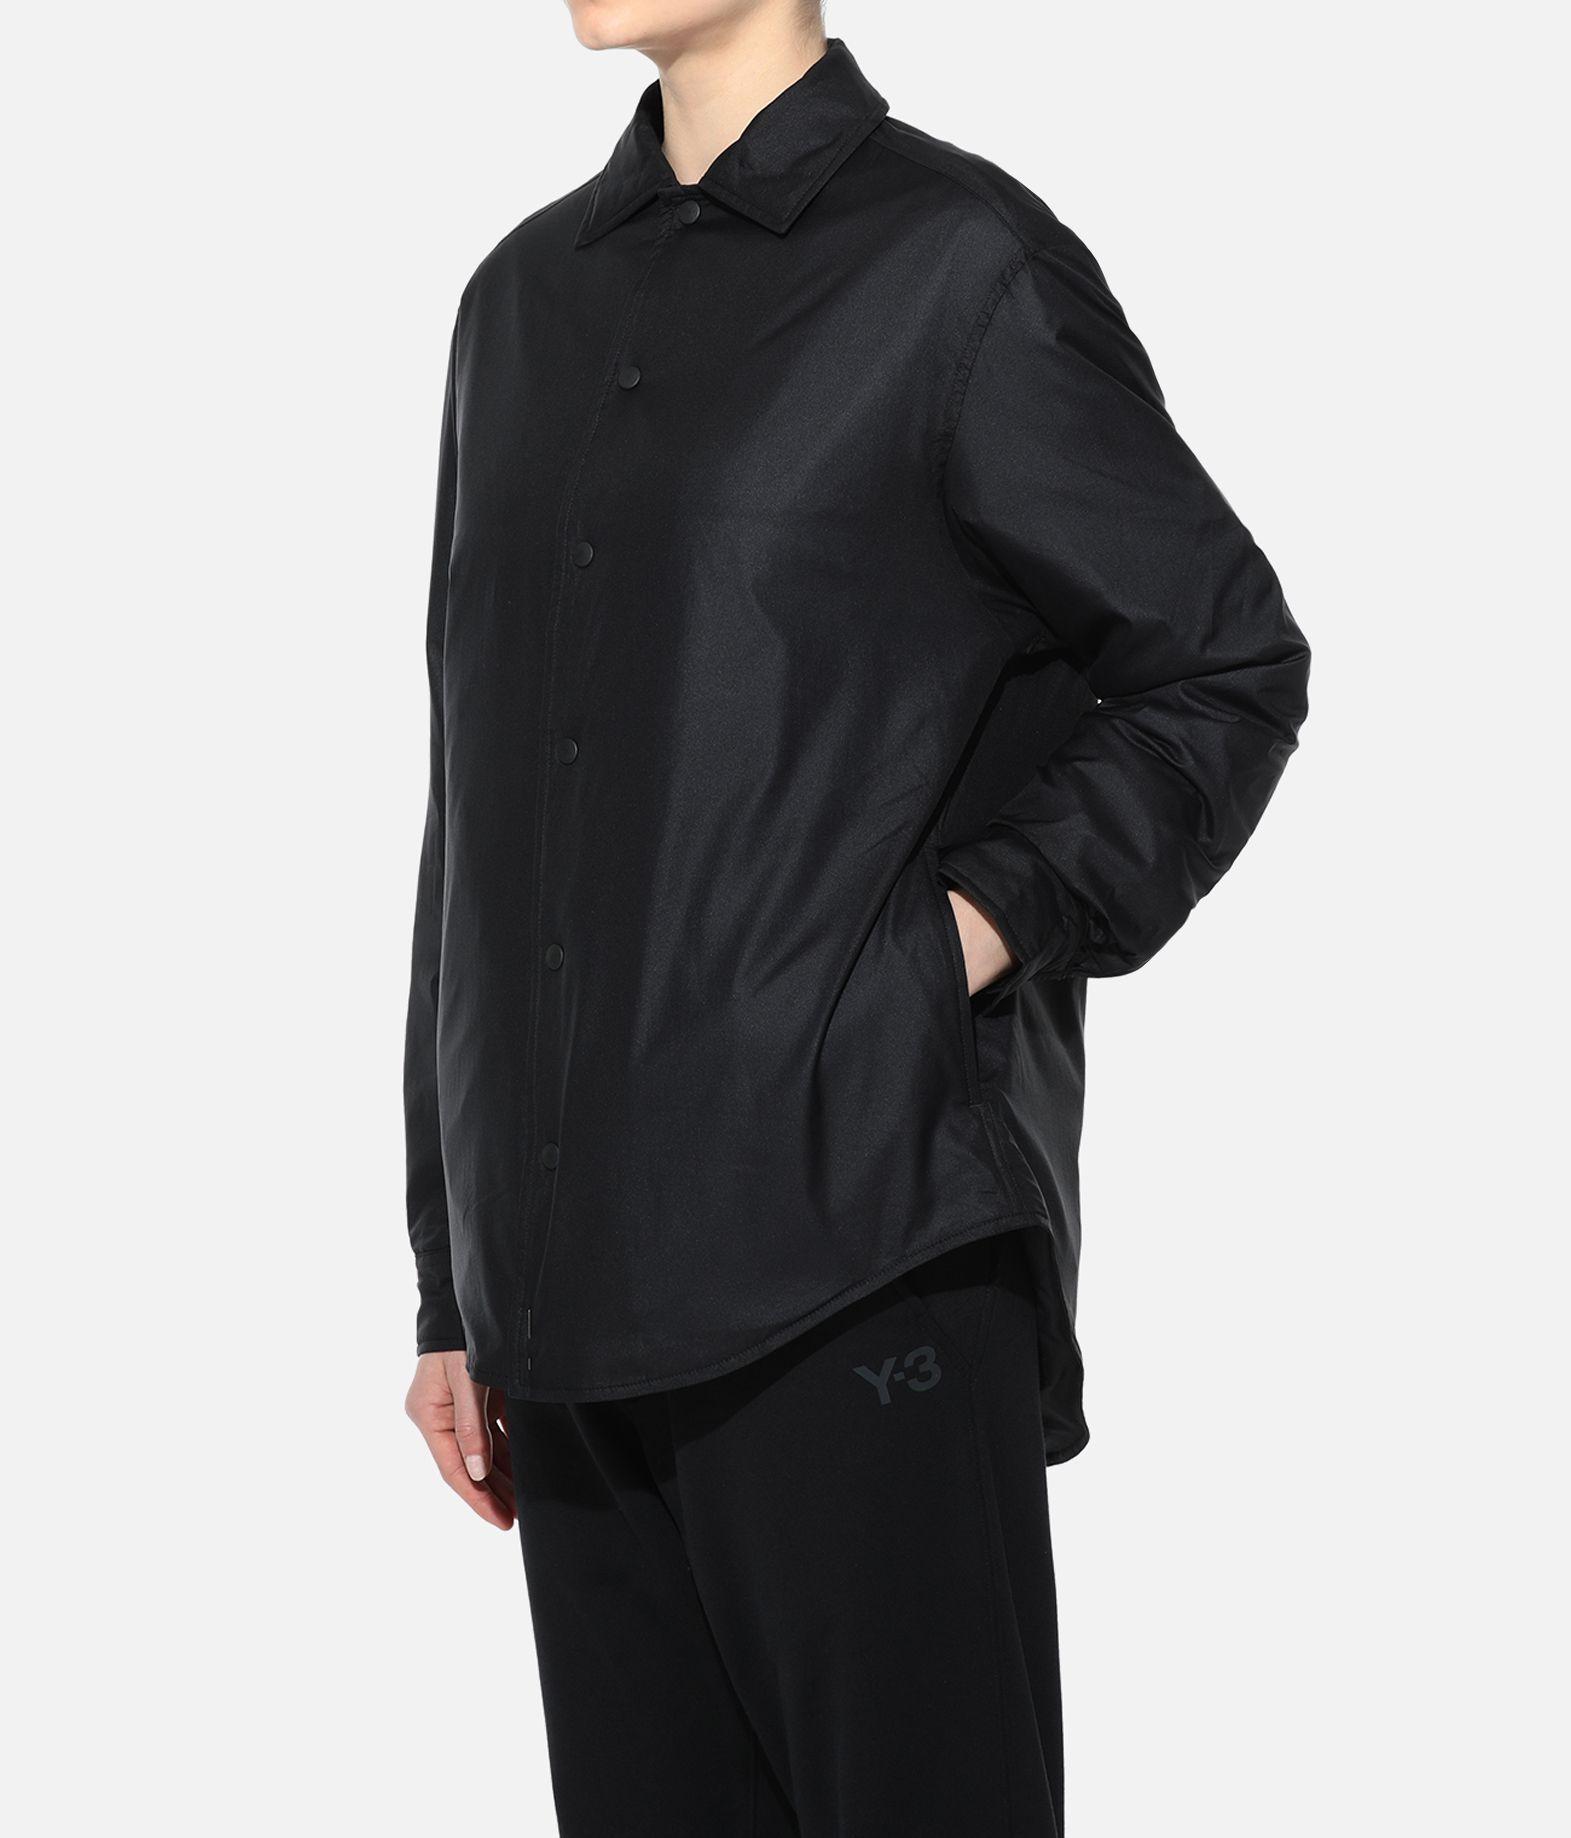 Y-3 Y-3 Adizero Padded Overshirt Blazer Woman e